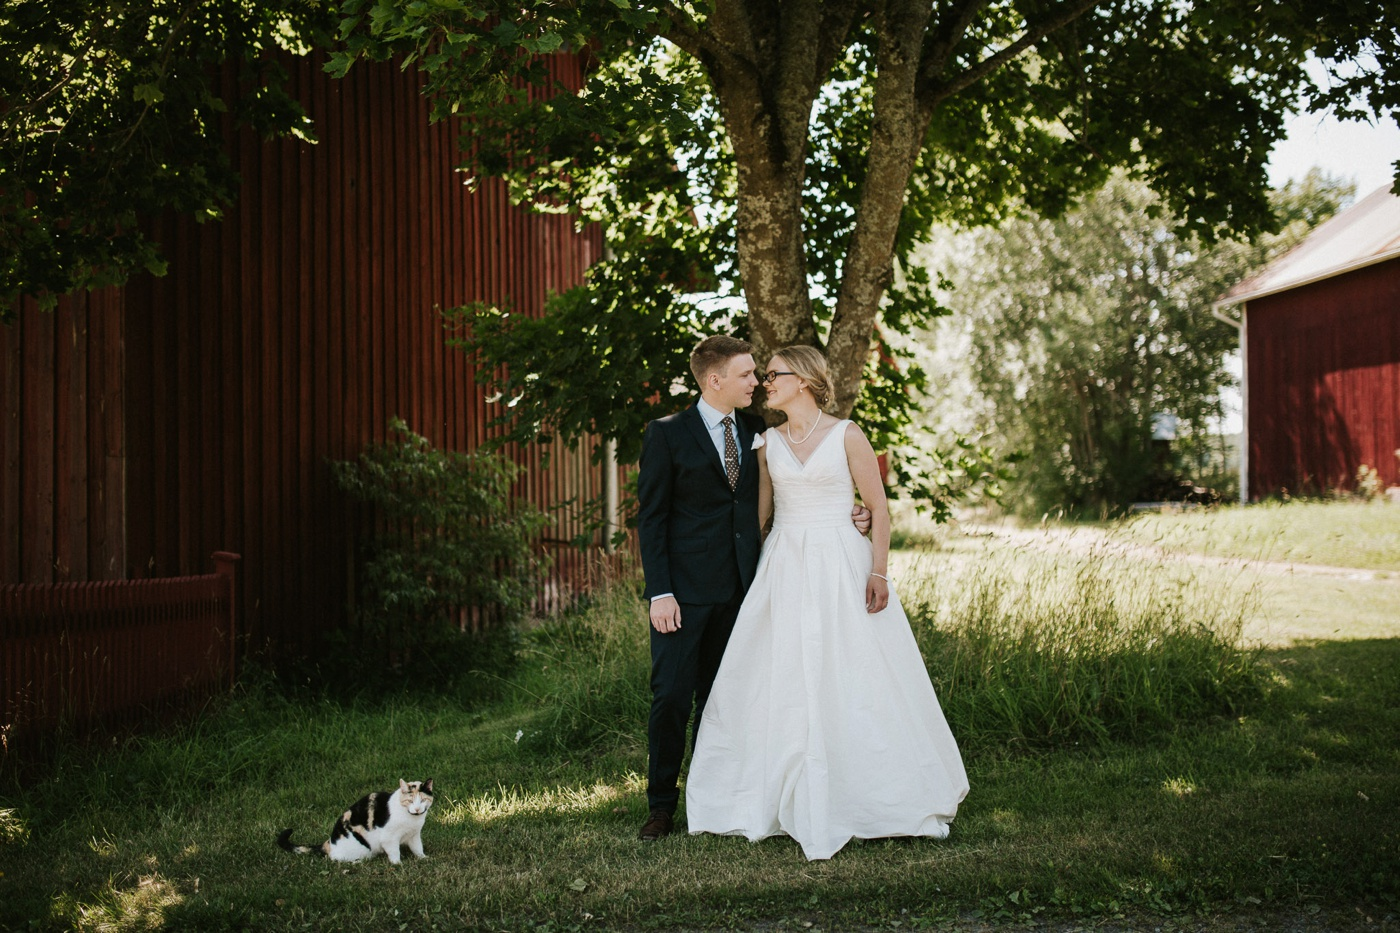 ceciliajoakim_sweden-countryside-summer-wedding_melbourne-fun-quirky-wedding-photography_51